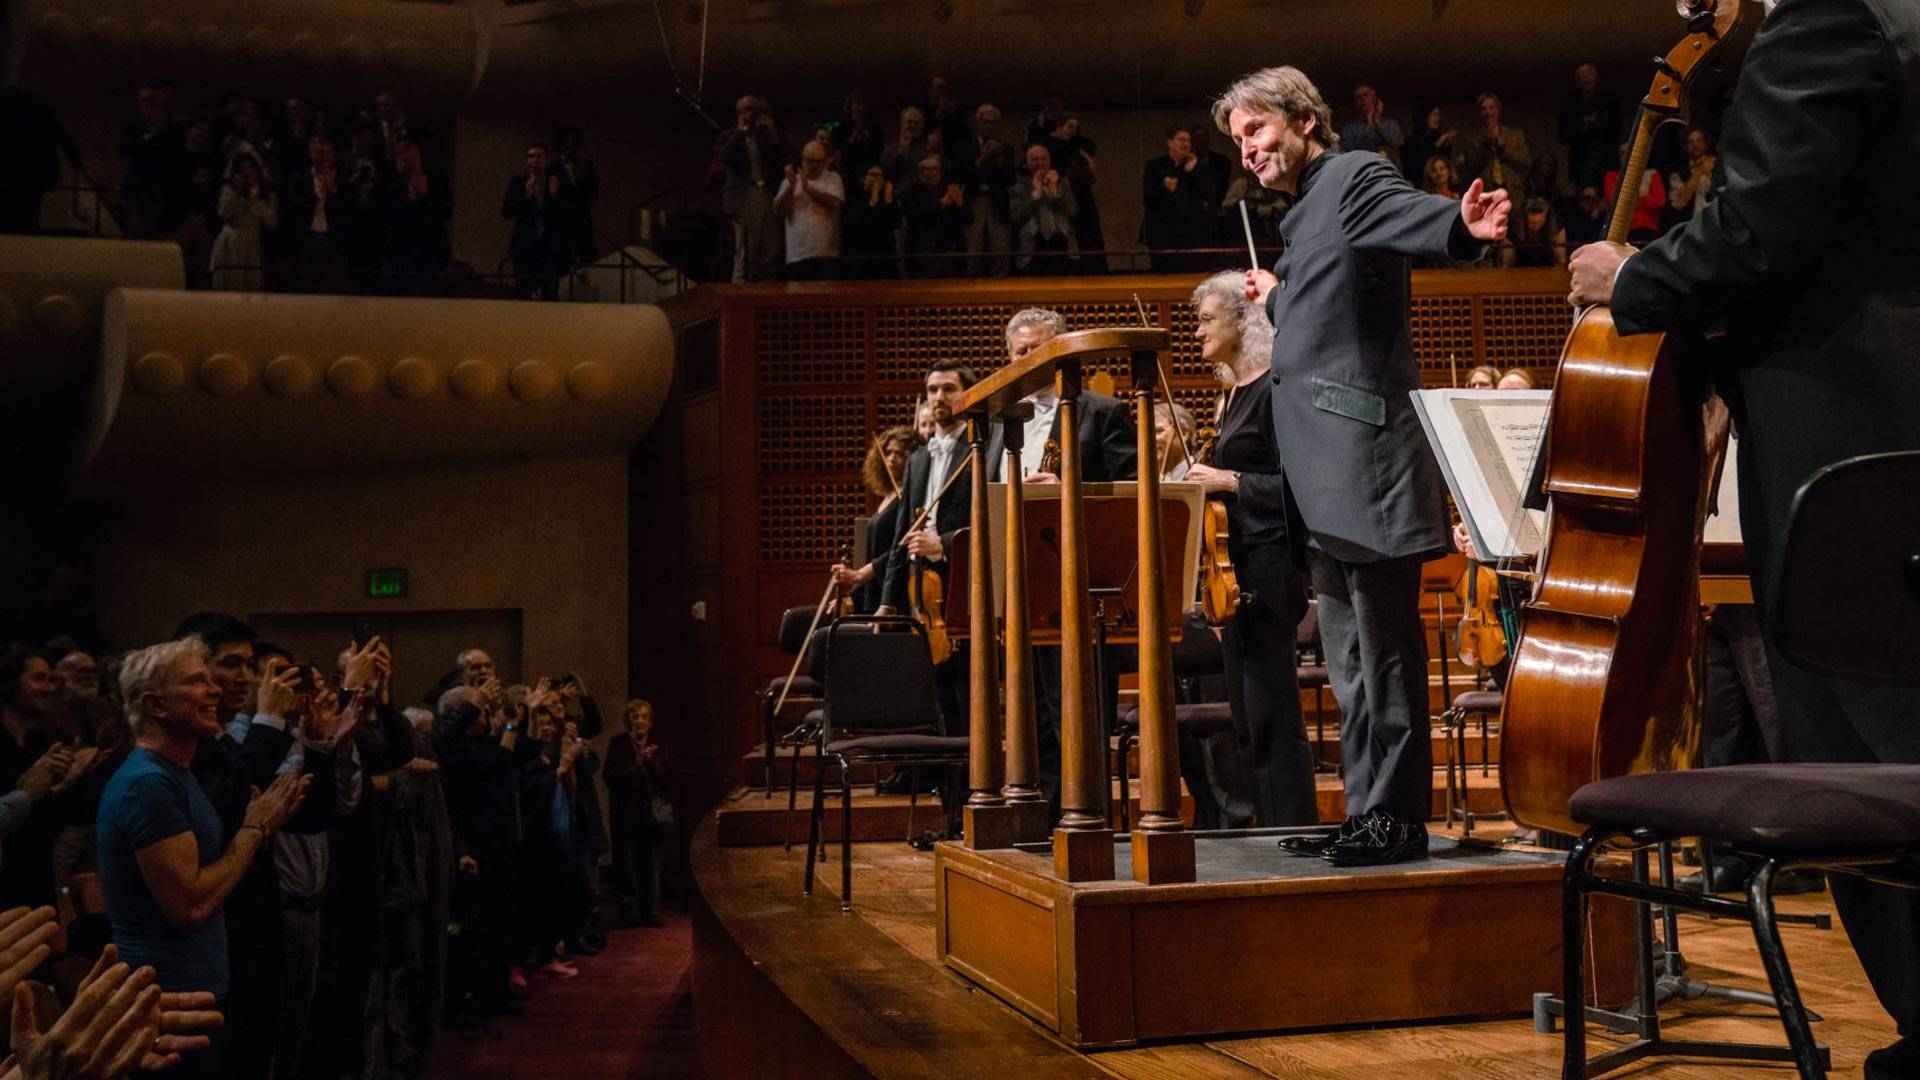 Esa-Pekka Salonen conducts the San Francisco Symphony on Jan. 18, 2019.  Brandon Patoc/San Francisco Symphony